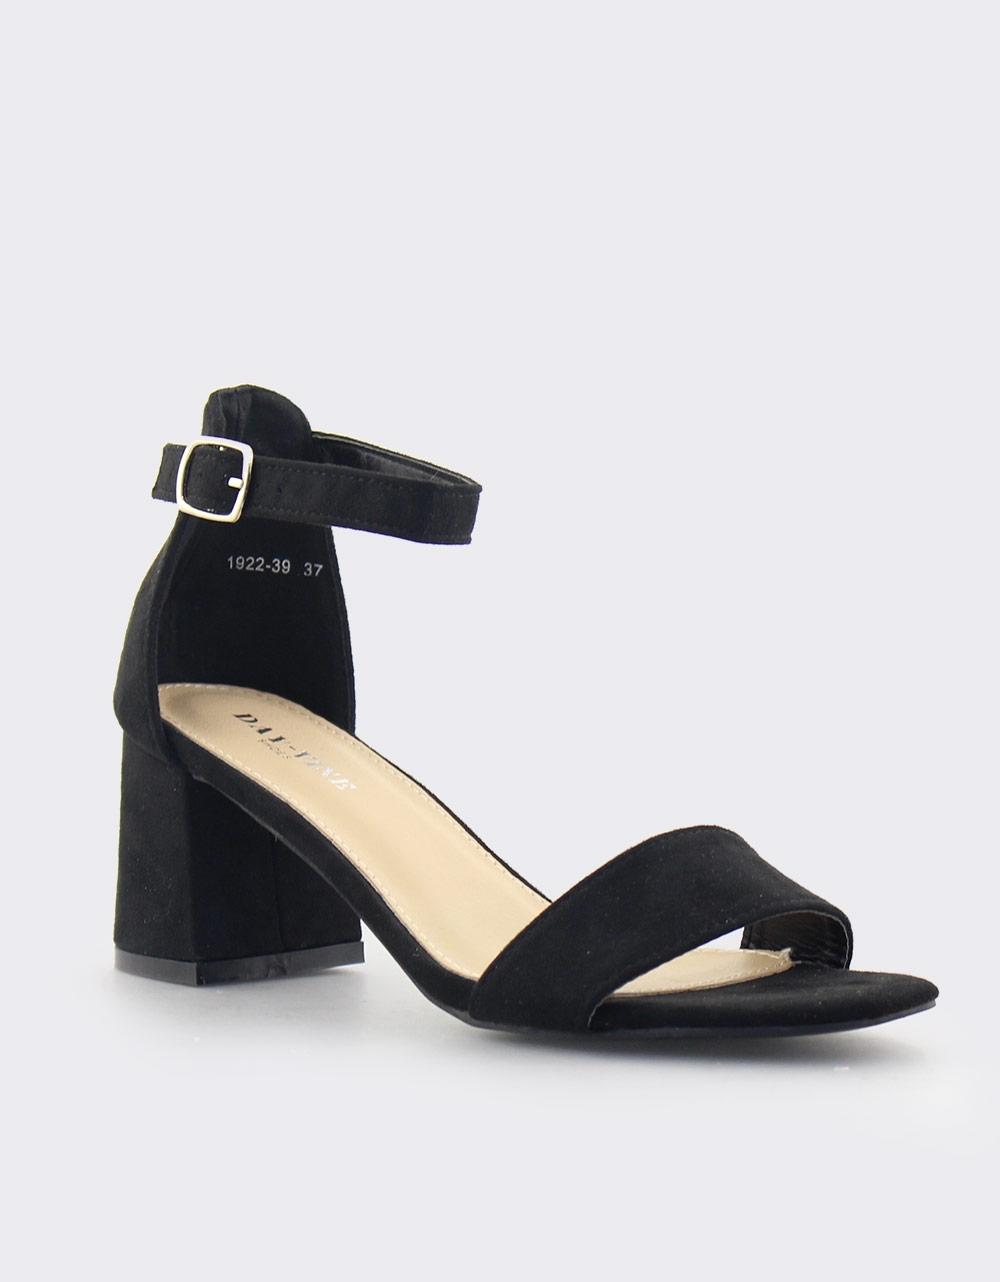 e86fe5fcc9a Inshoes.gr. Γυναικεία πέδιλα με καρέ τακούνι   Inshoes.gr Μαύρο